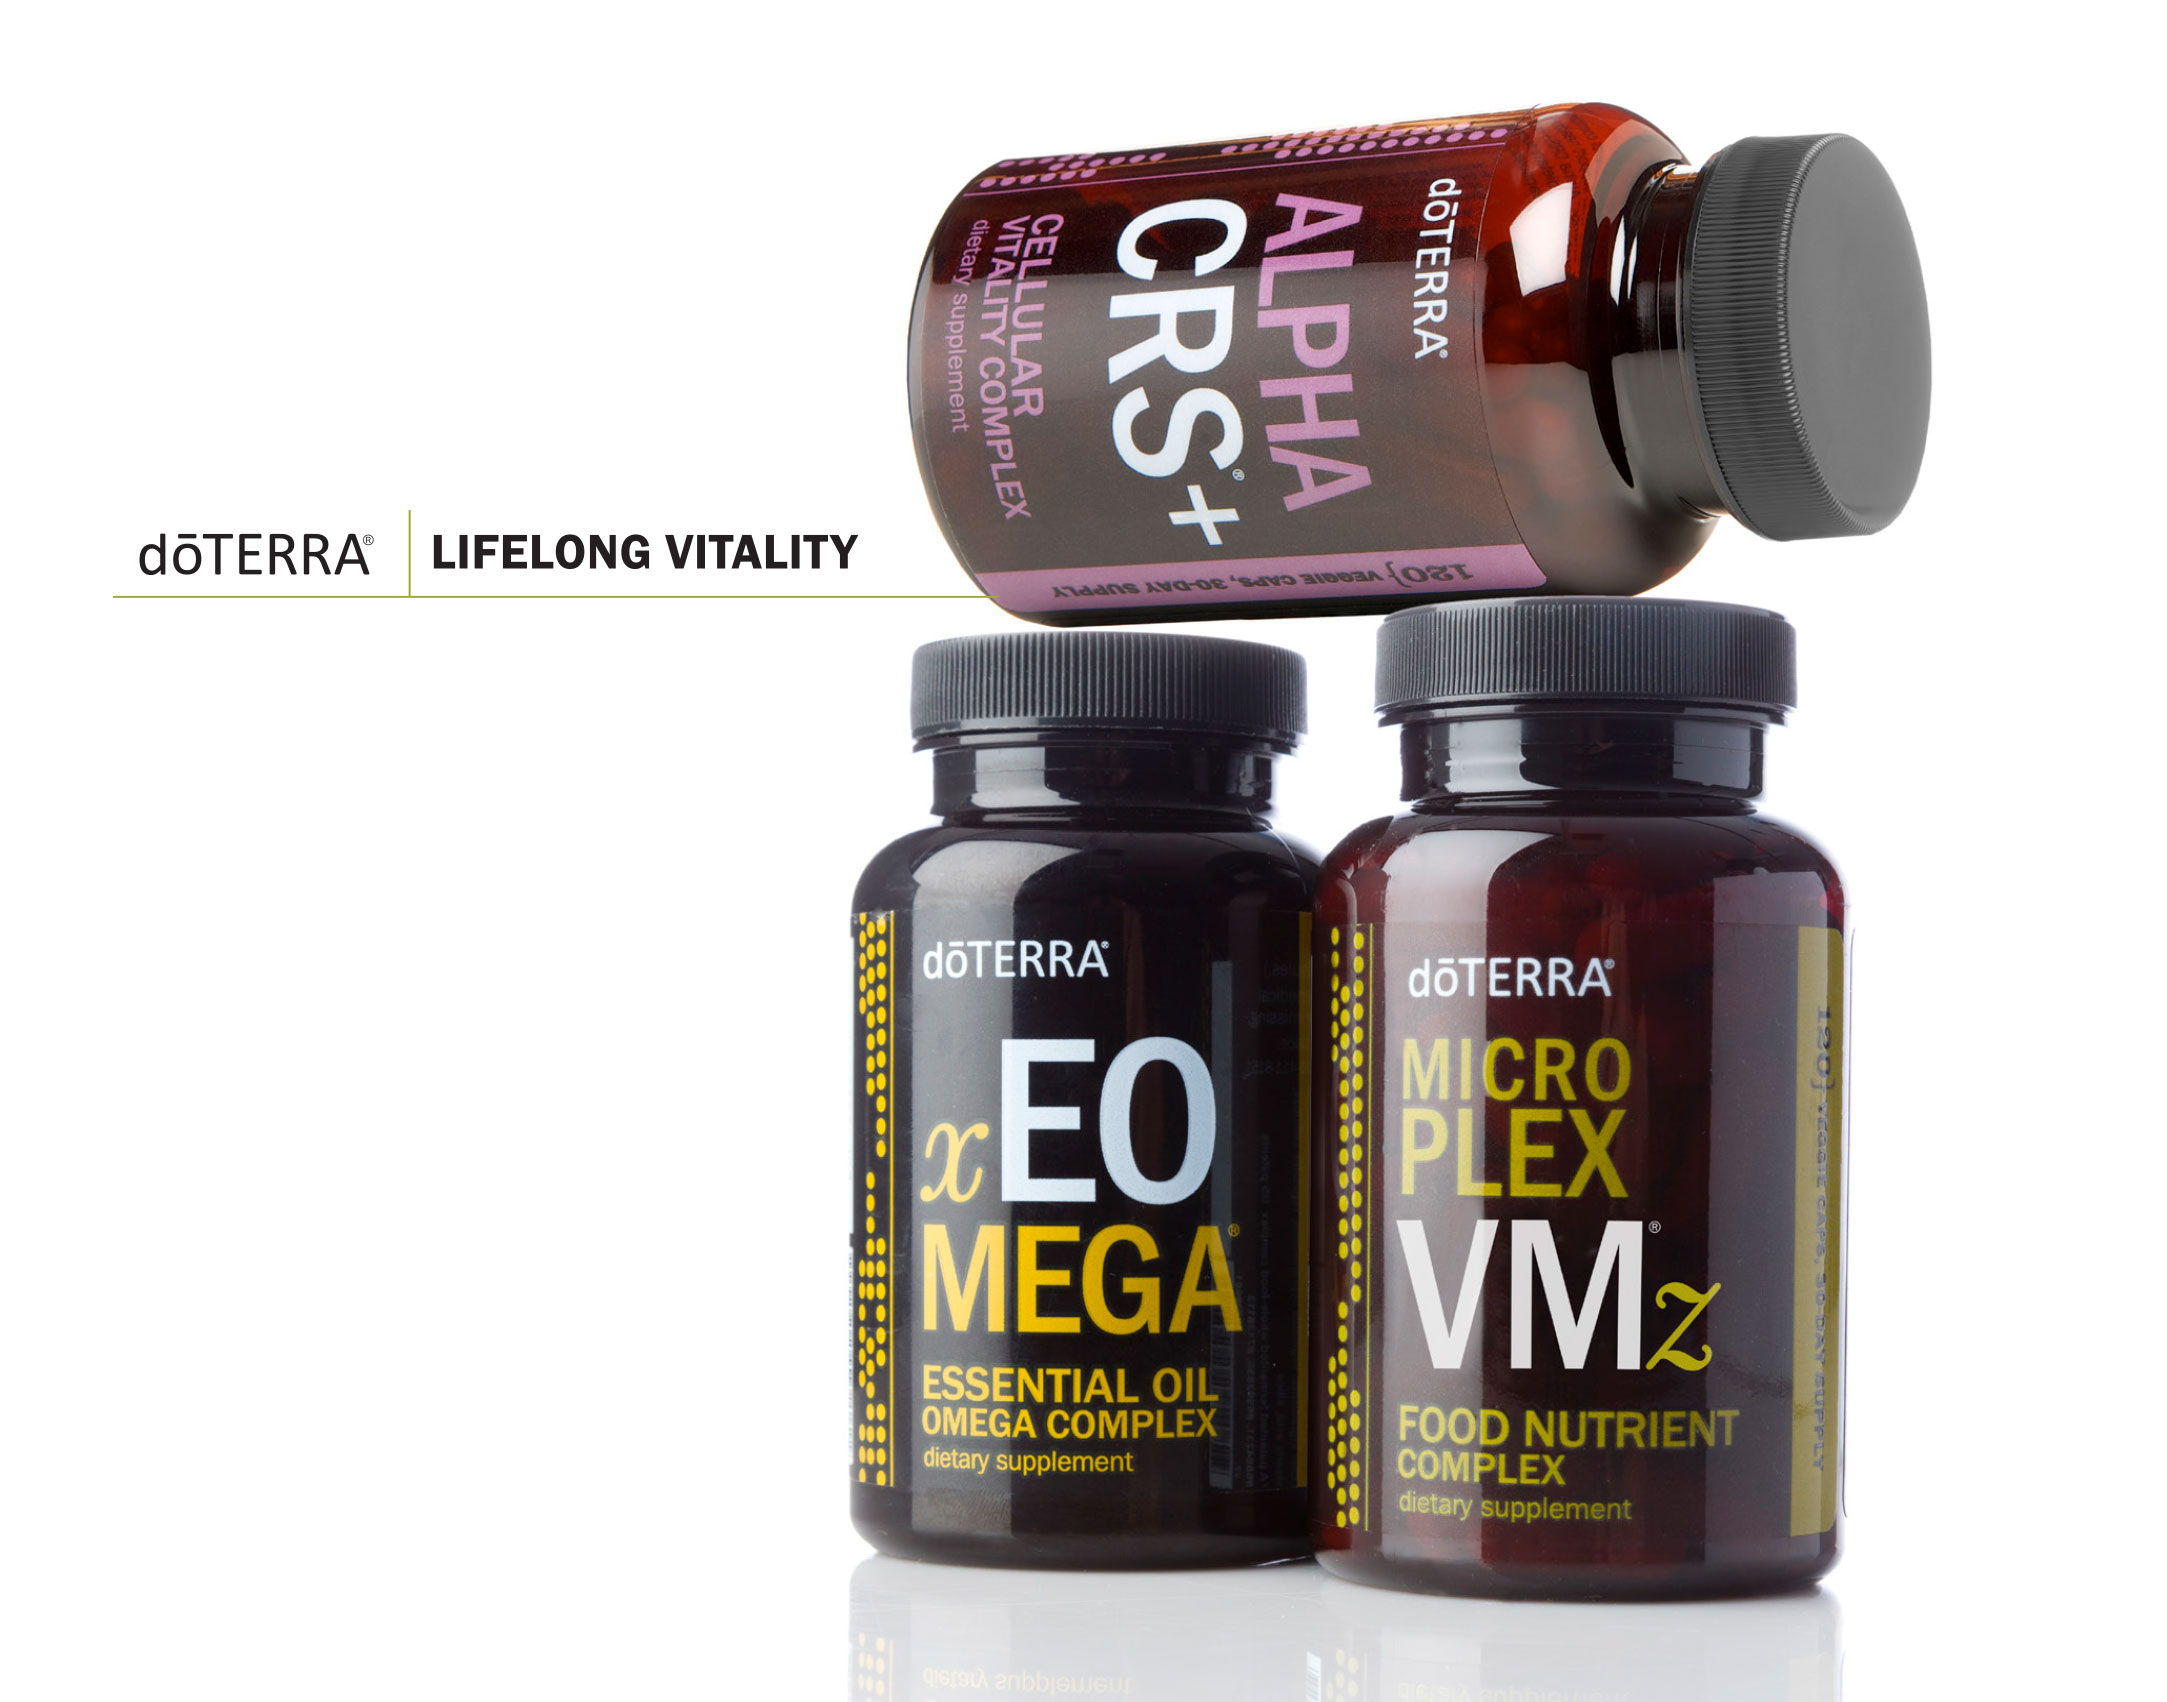 lifelong-vitality-1.jpg